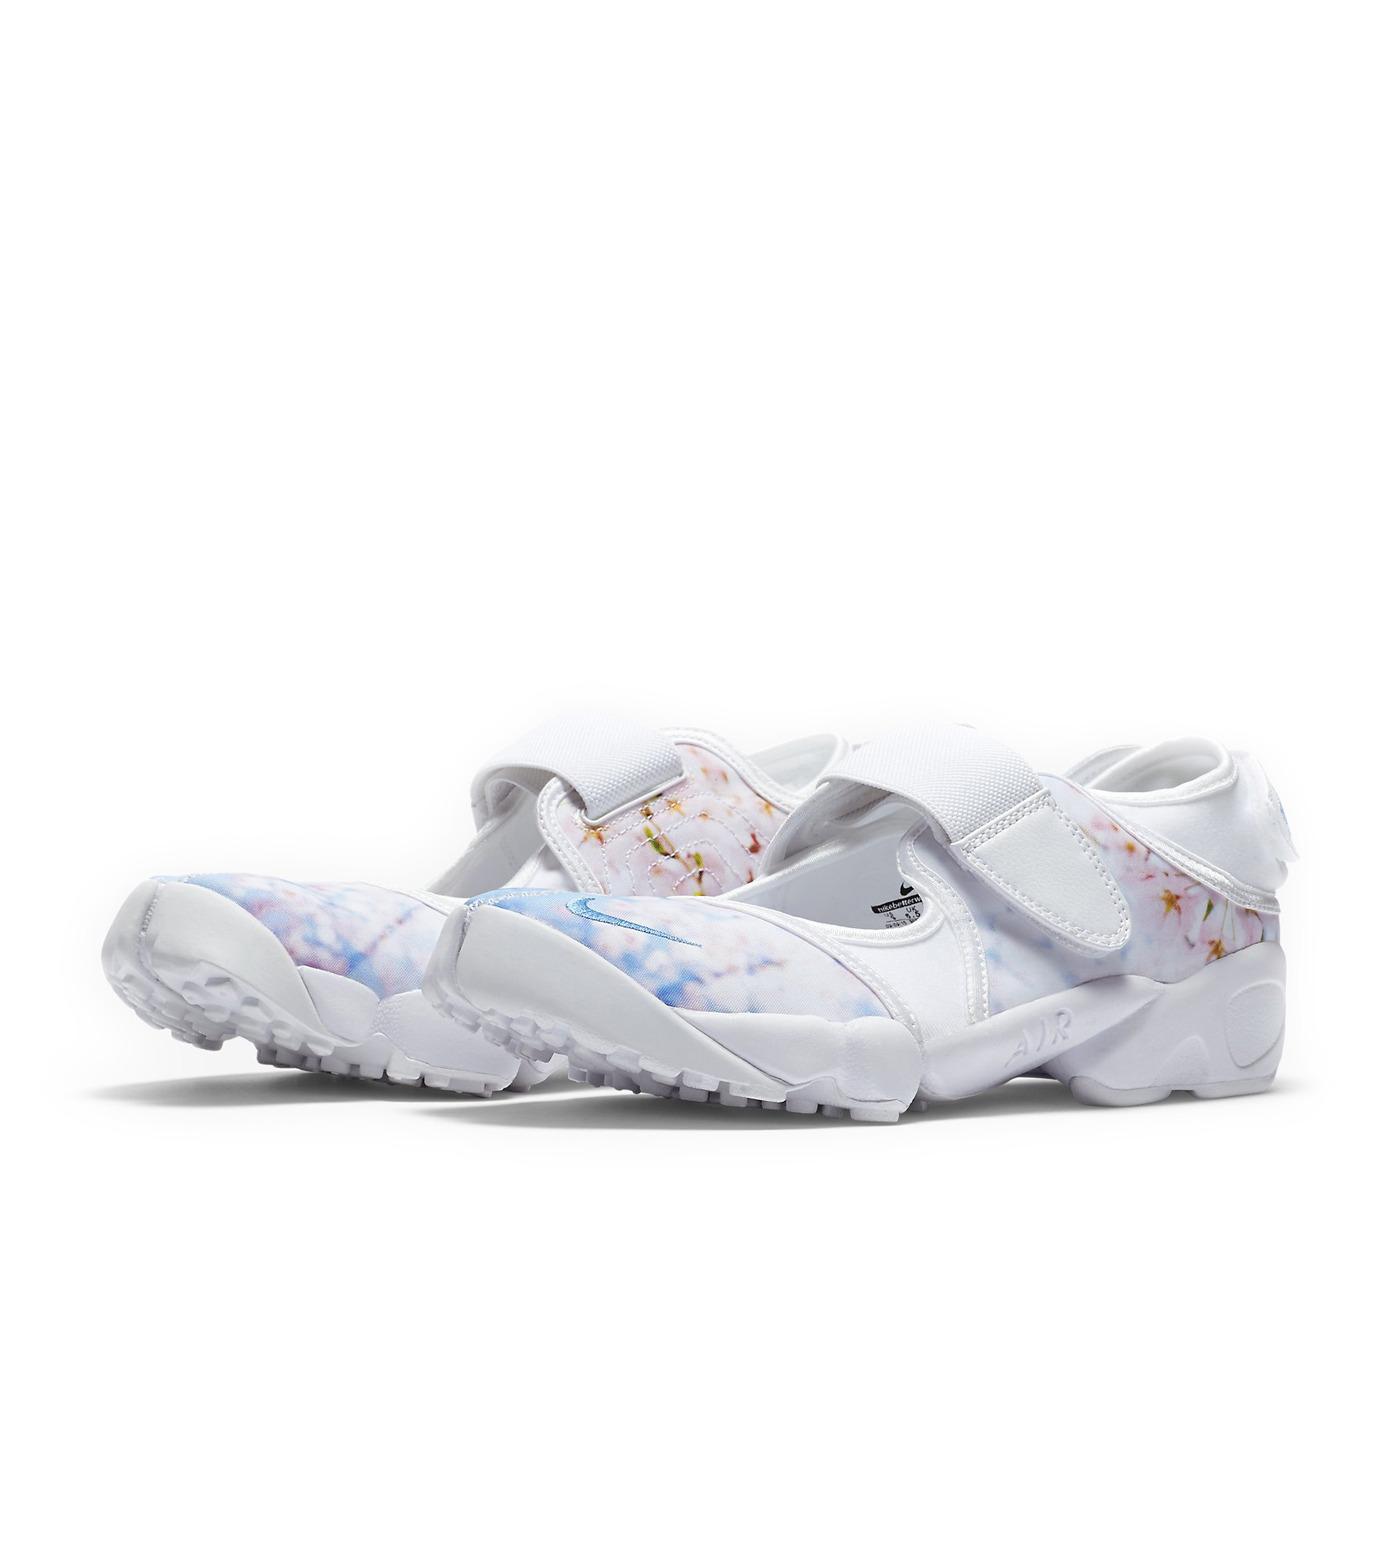 NIKE(ナイキ)のAIR RIFT PRINT-WHITE(シューズ/shoes)-807398-101-4 拡大詳細画像4